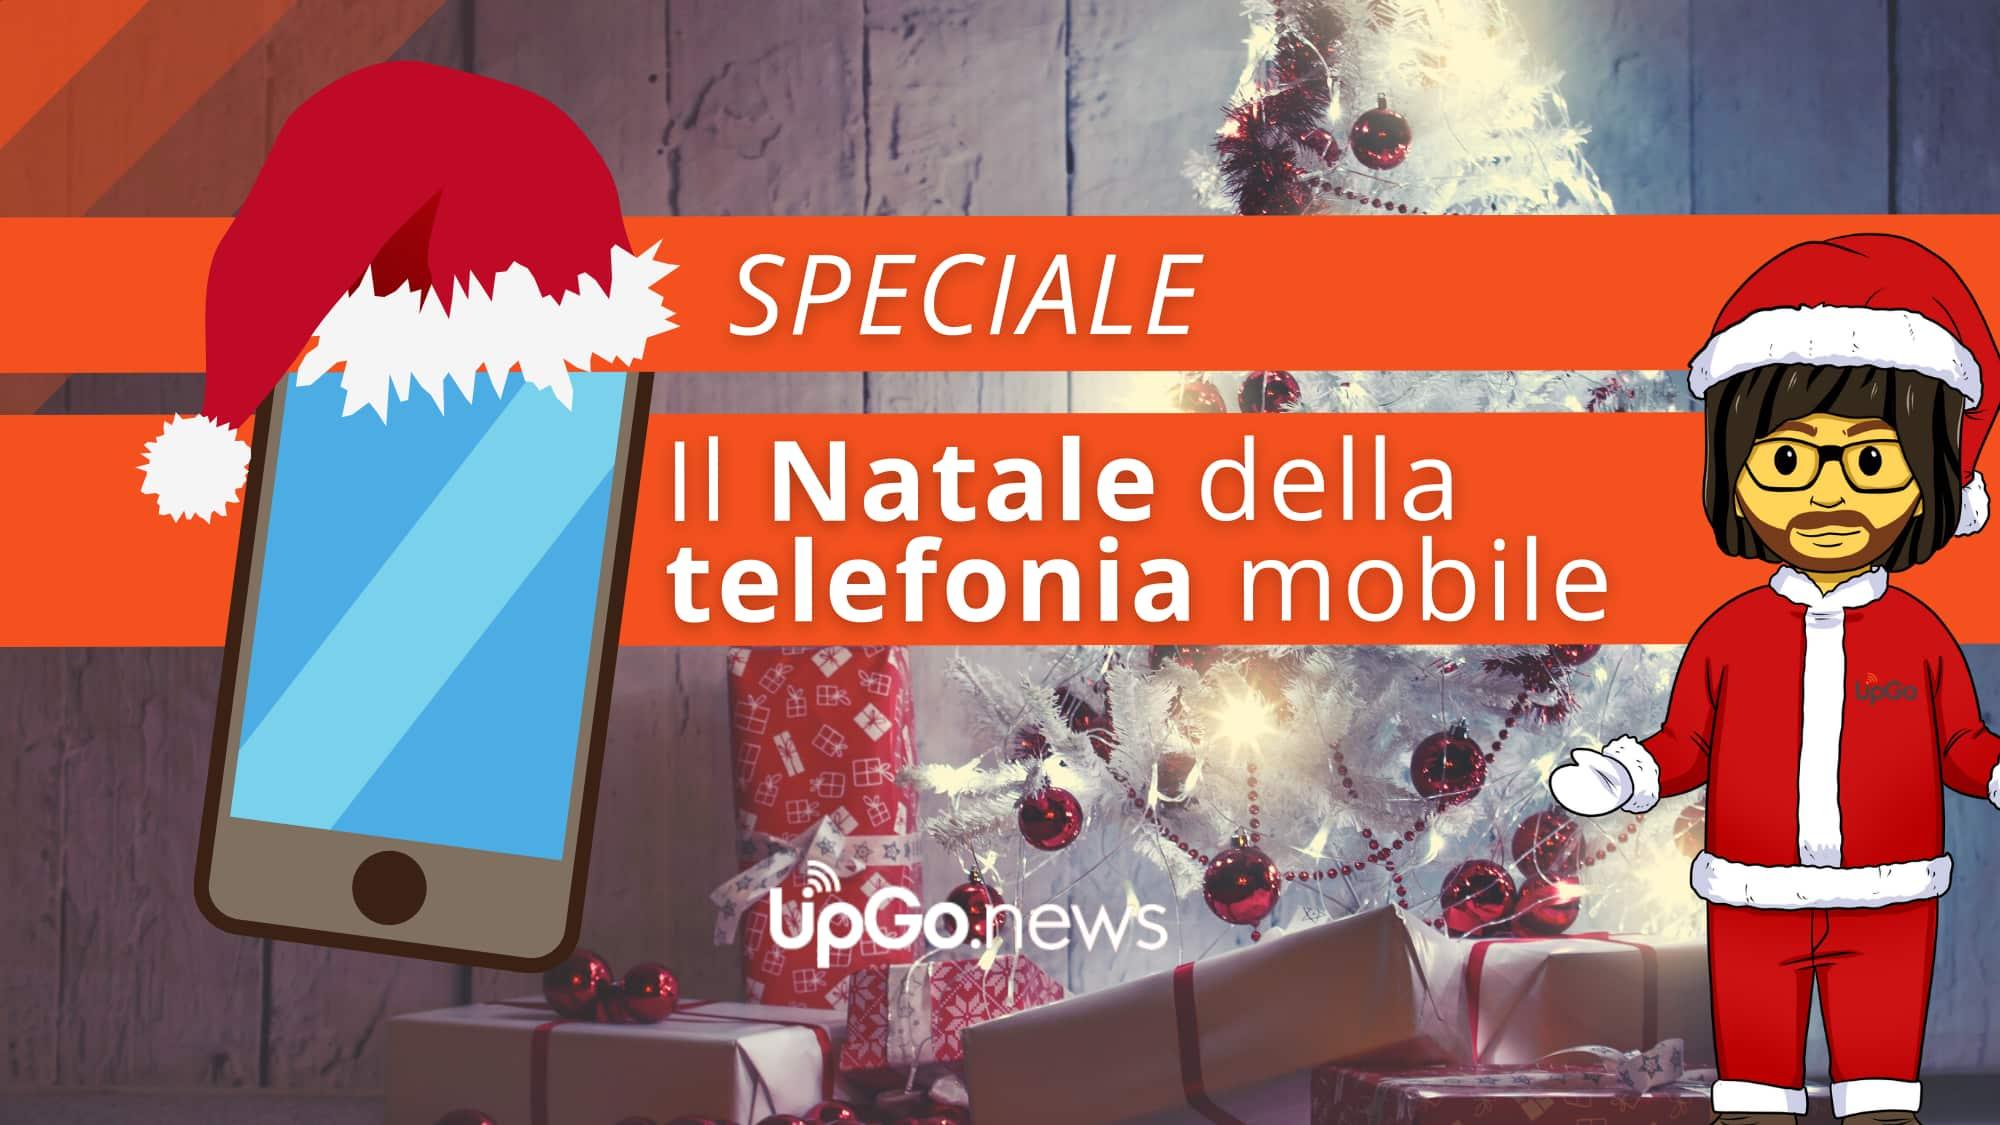 Offerte Natale Telefonia